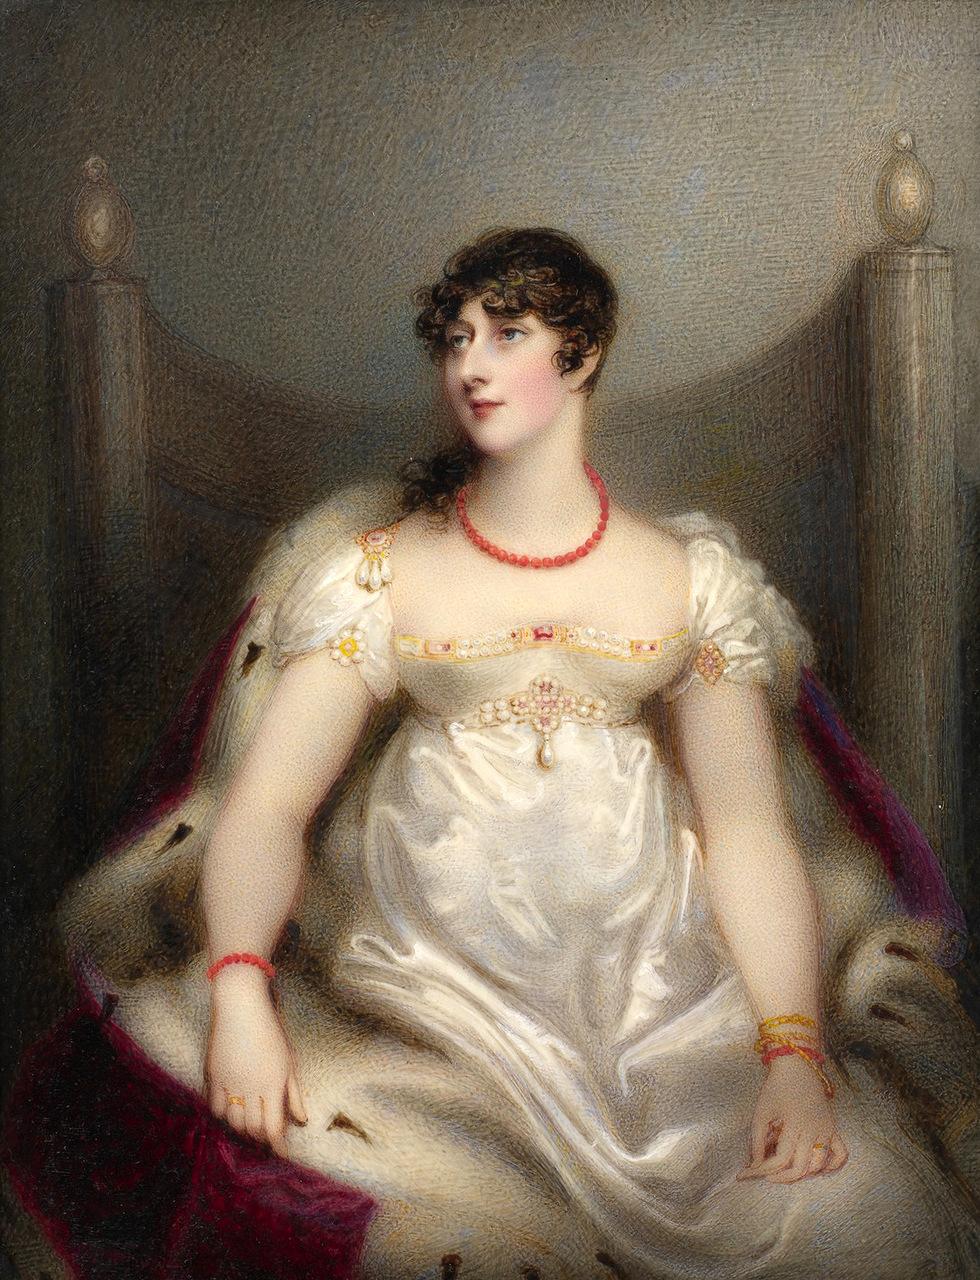 Charlotte, Duchess of Beaufort